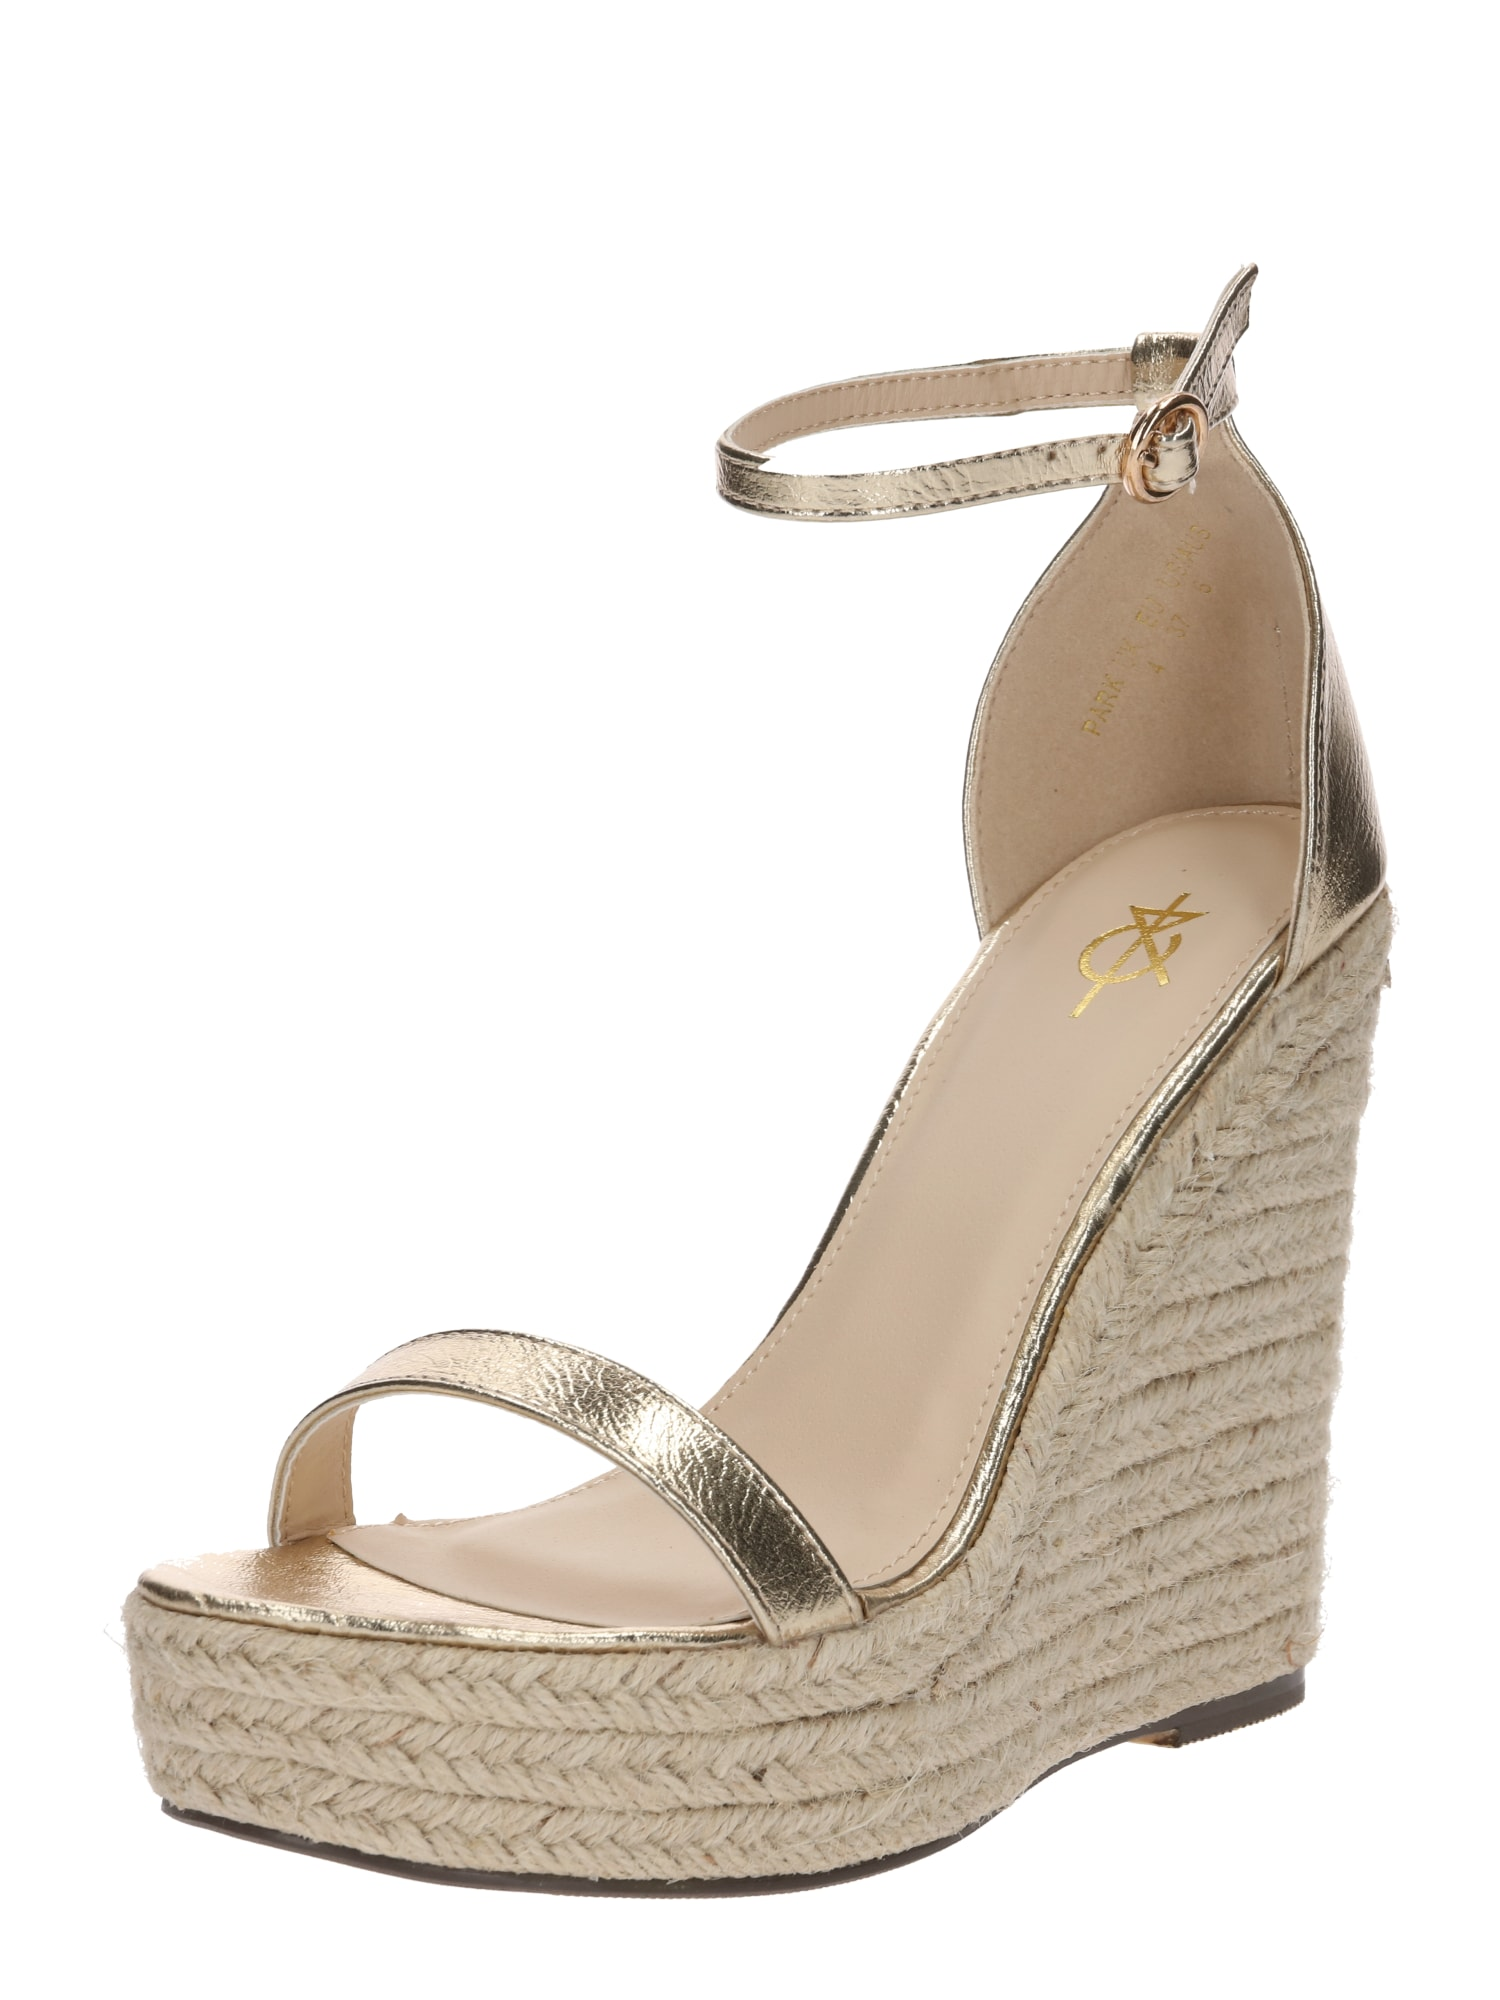 Páskové sandály zlatá 4th & Reckless